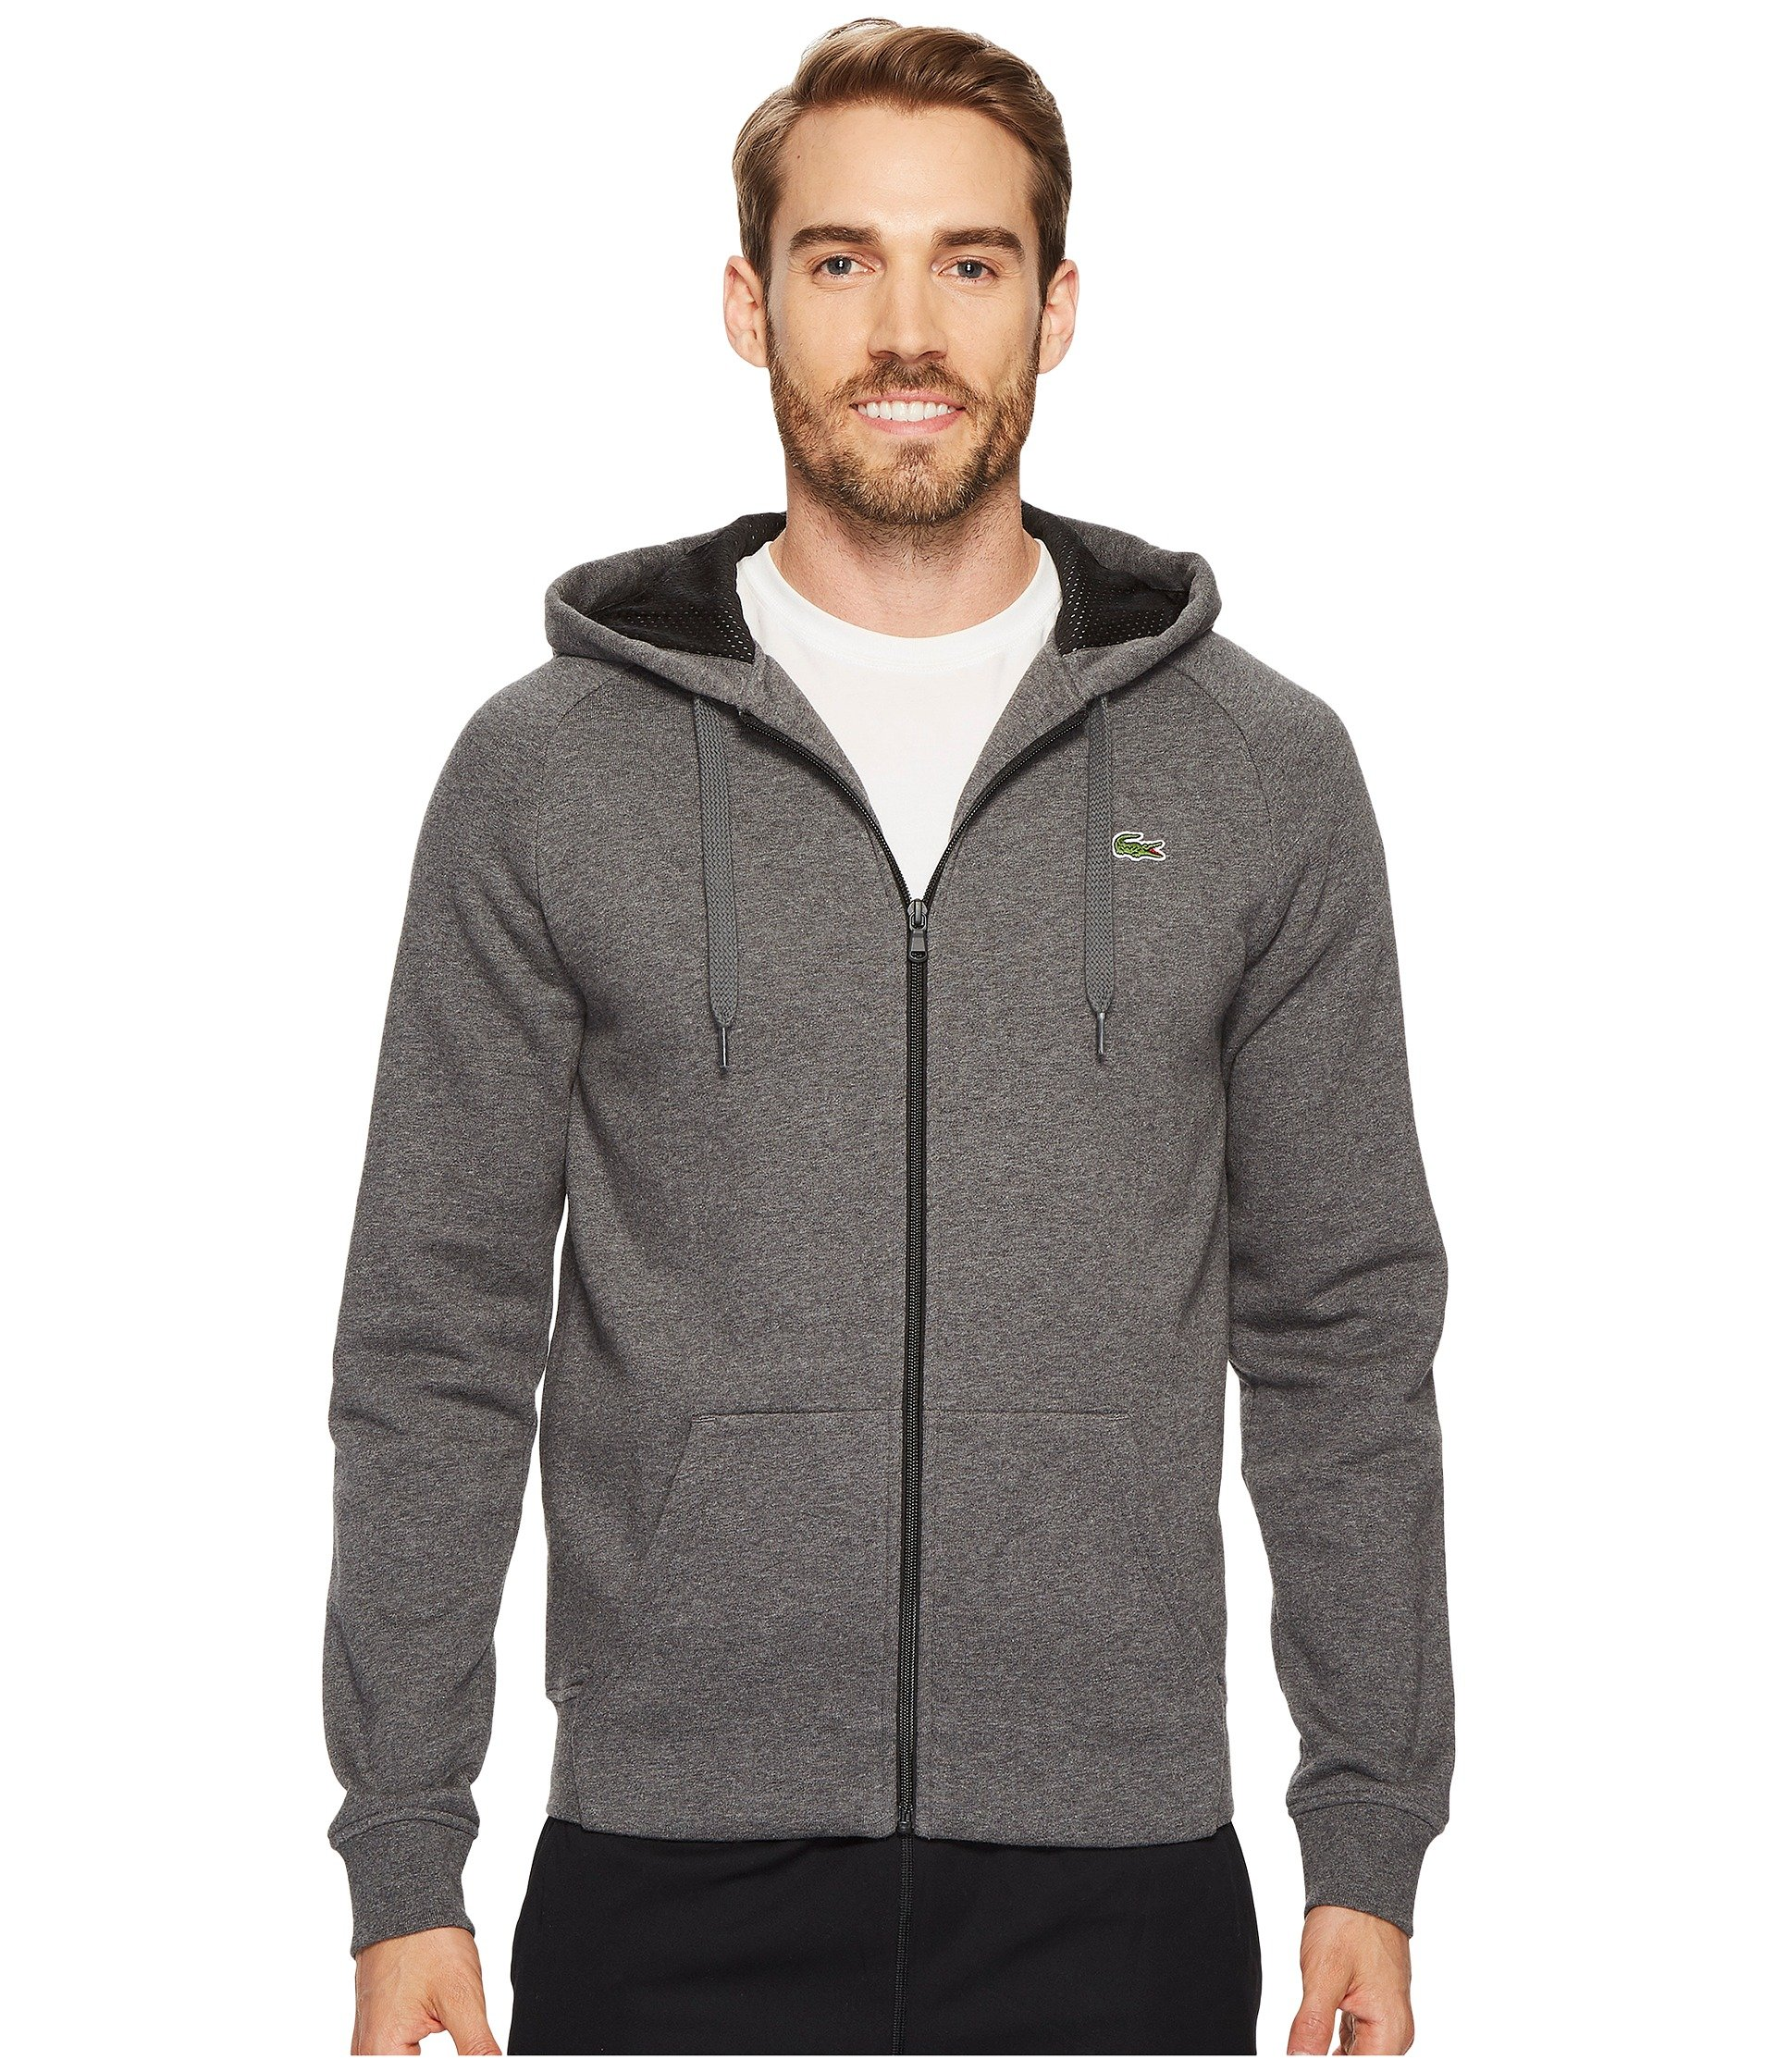 Buzo o Chaqueta Deportiva para Hombre Lacoste Brushed Fleece Full Zip Hoodie Sweatshirt with 3D Print On Hood  + Lacoste en VeoyCompro.net